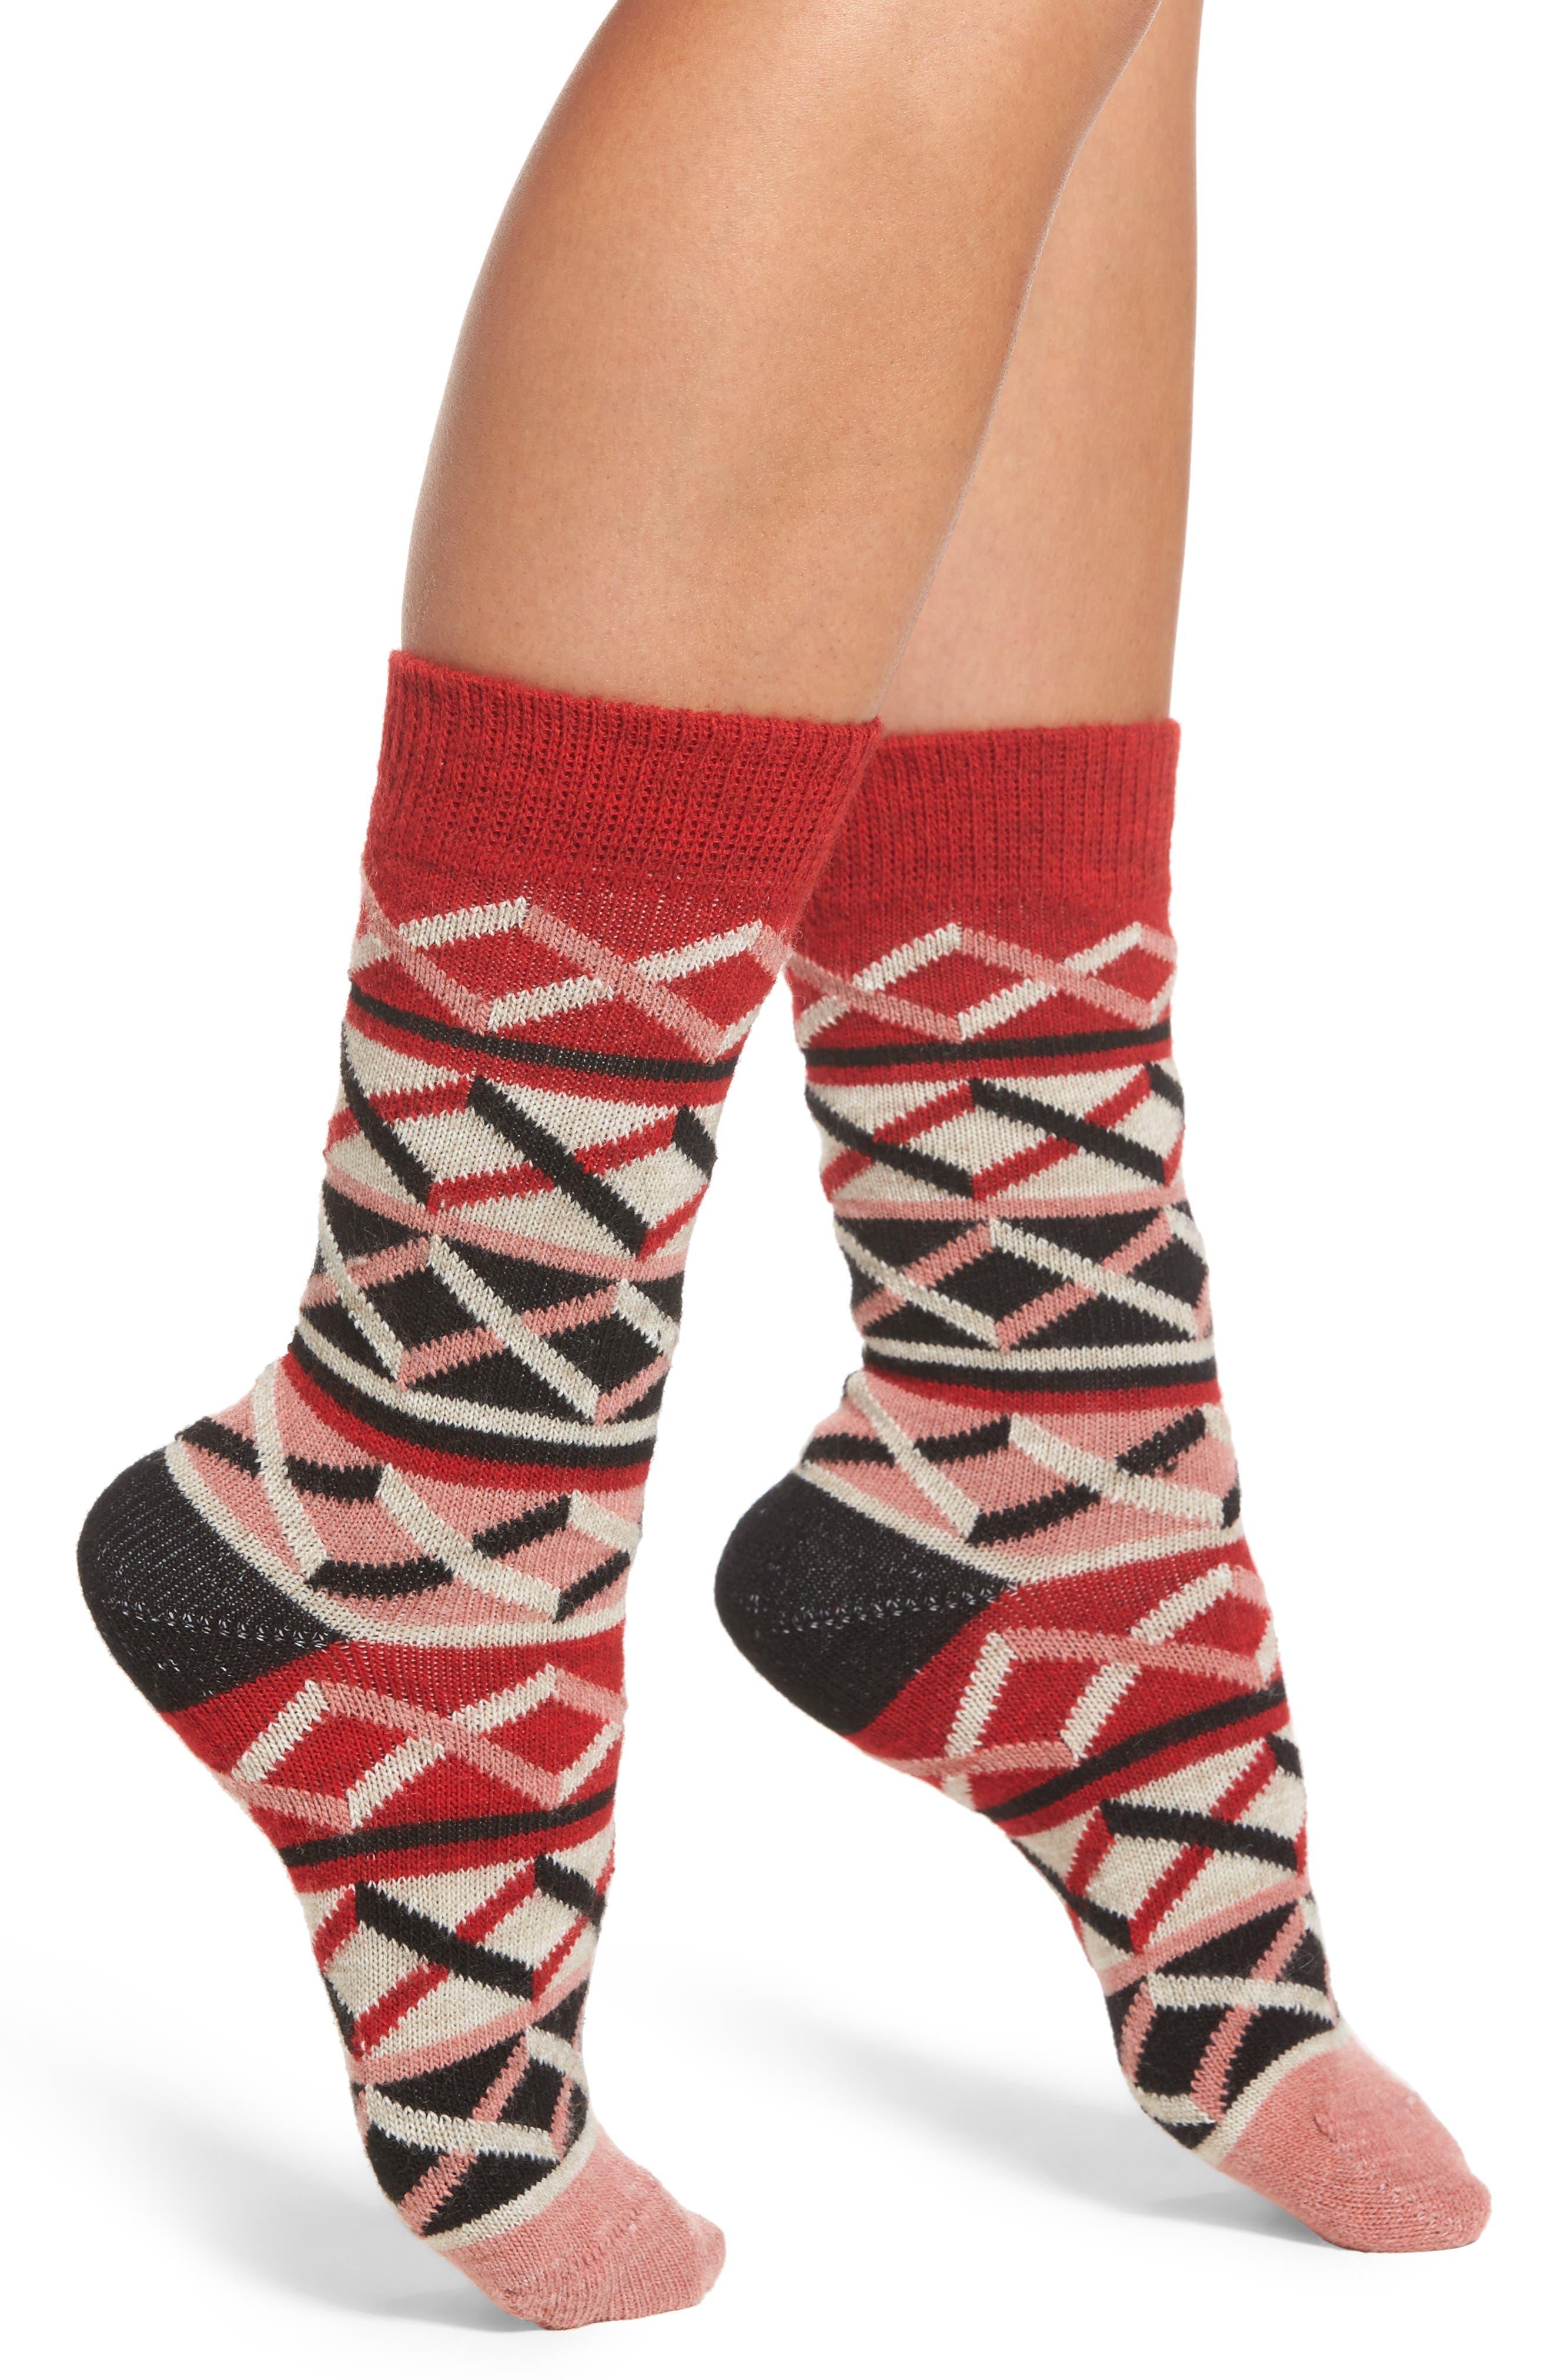 Hysteria by Happy Socks Ellinor Crew Socks